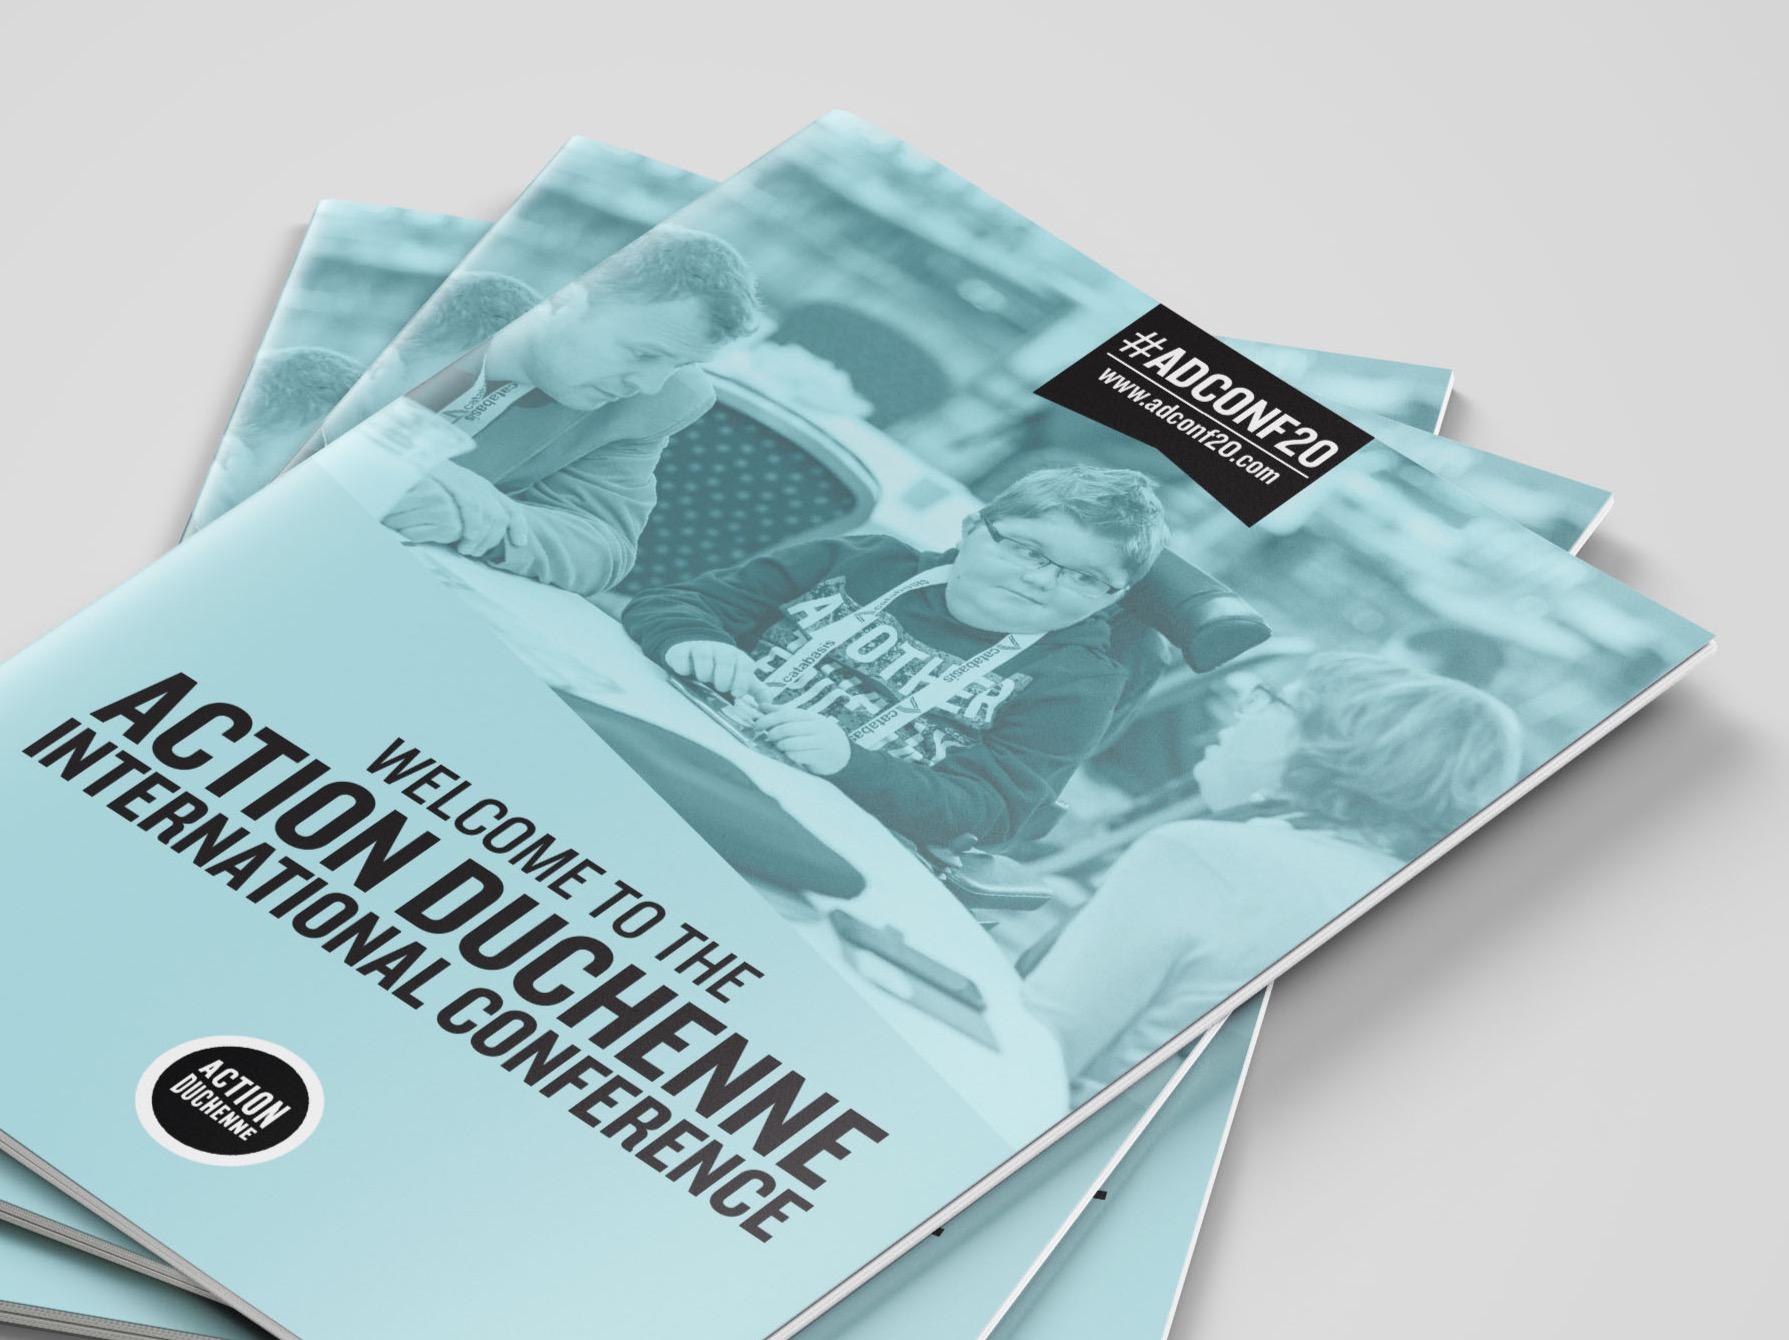 Action Duchenne Conference Brochure